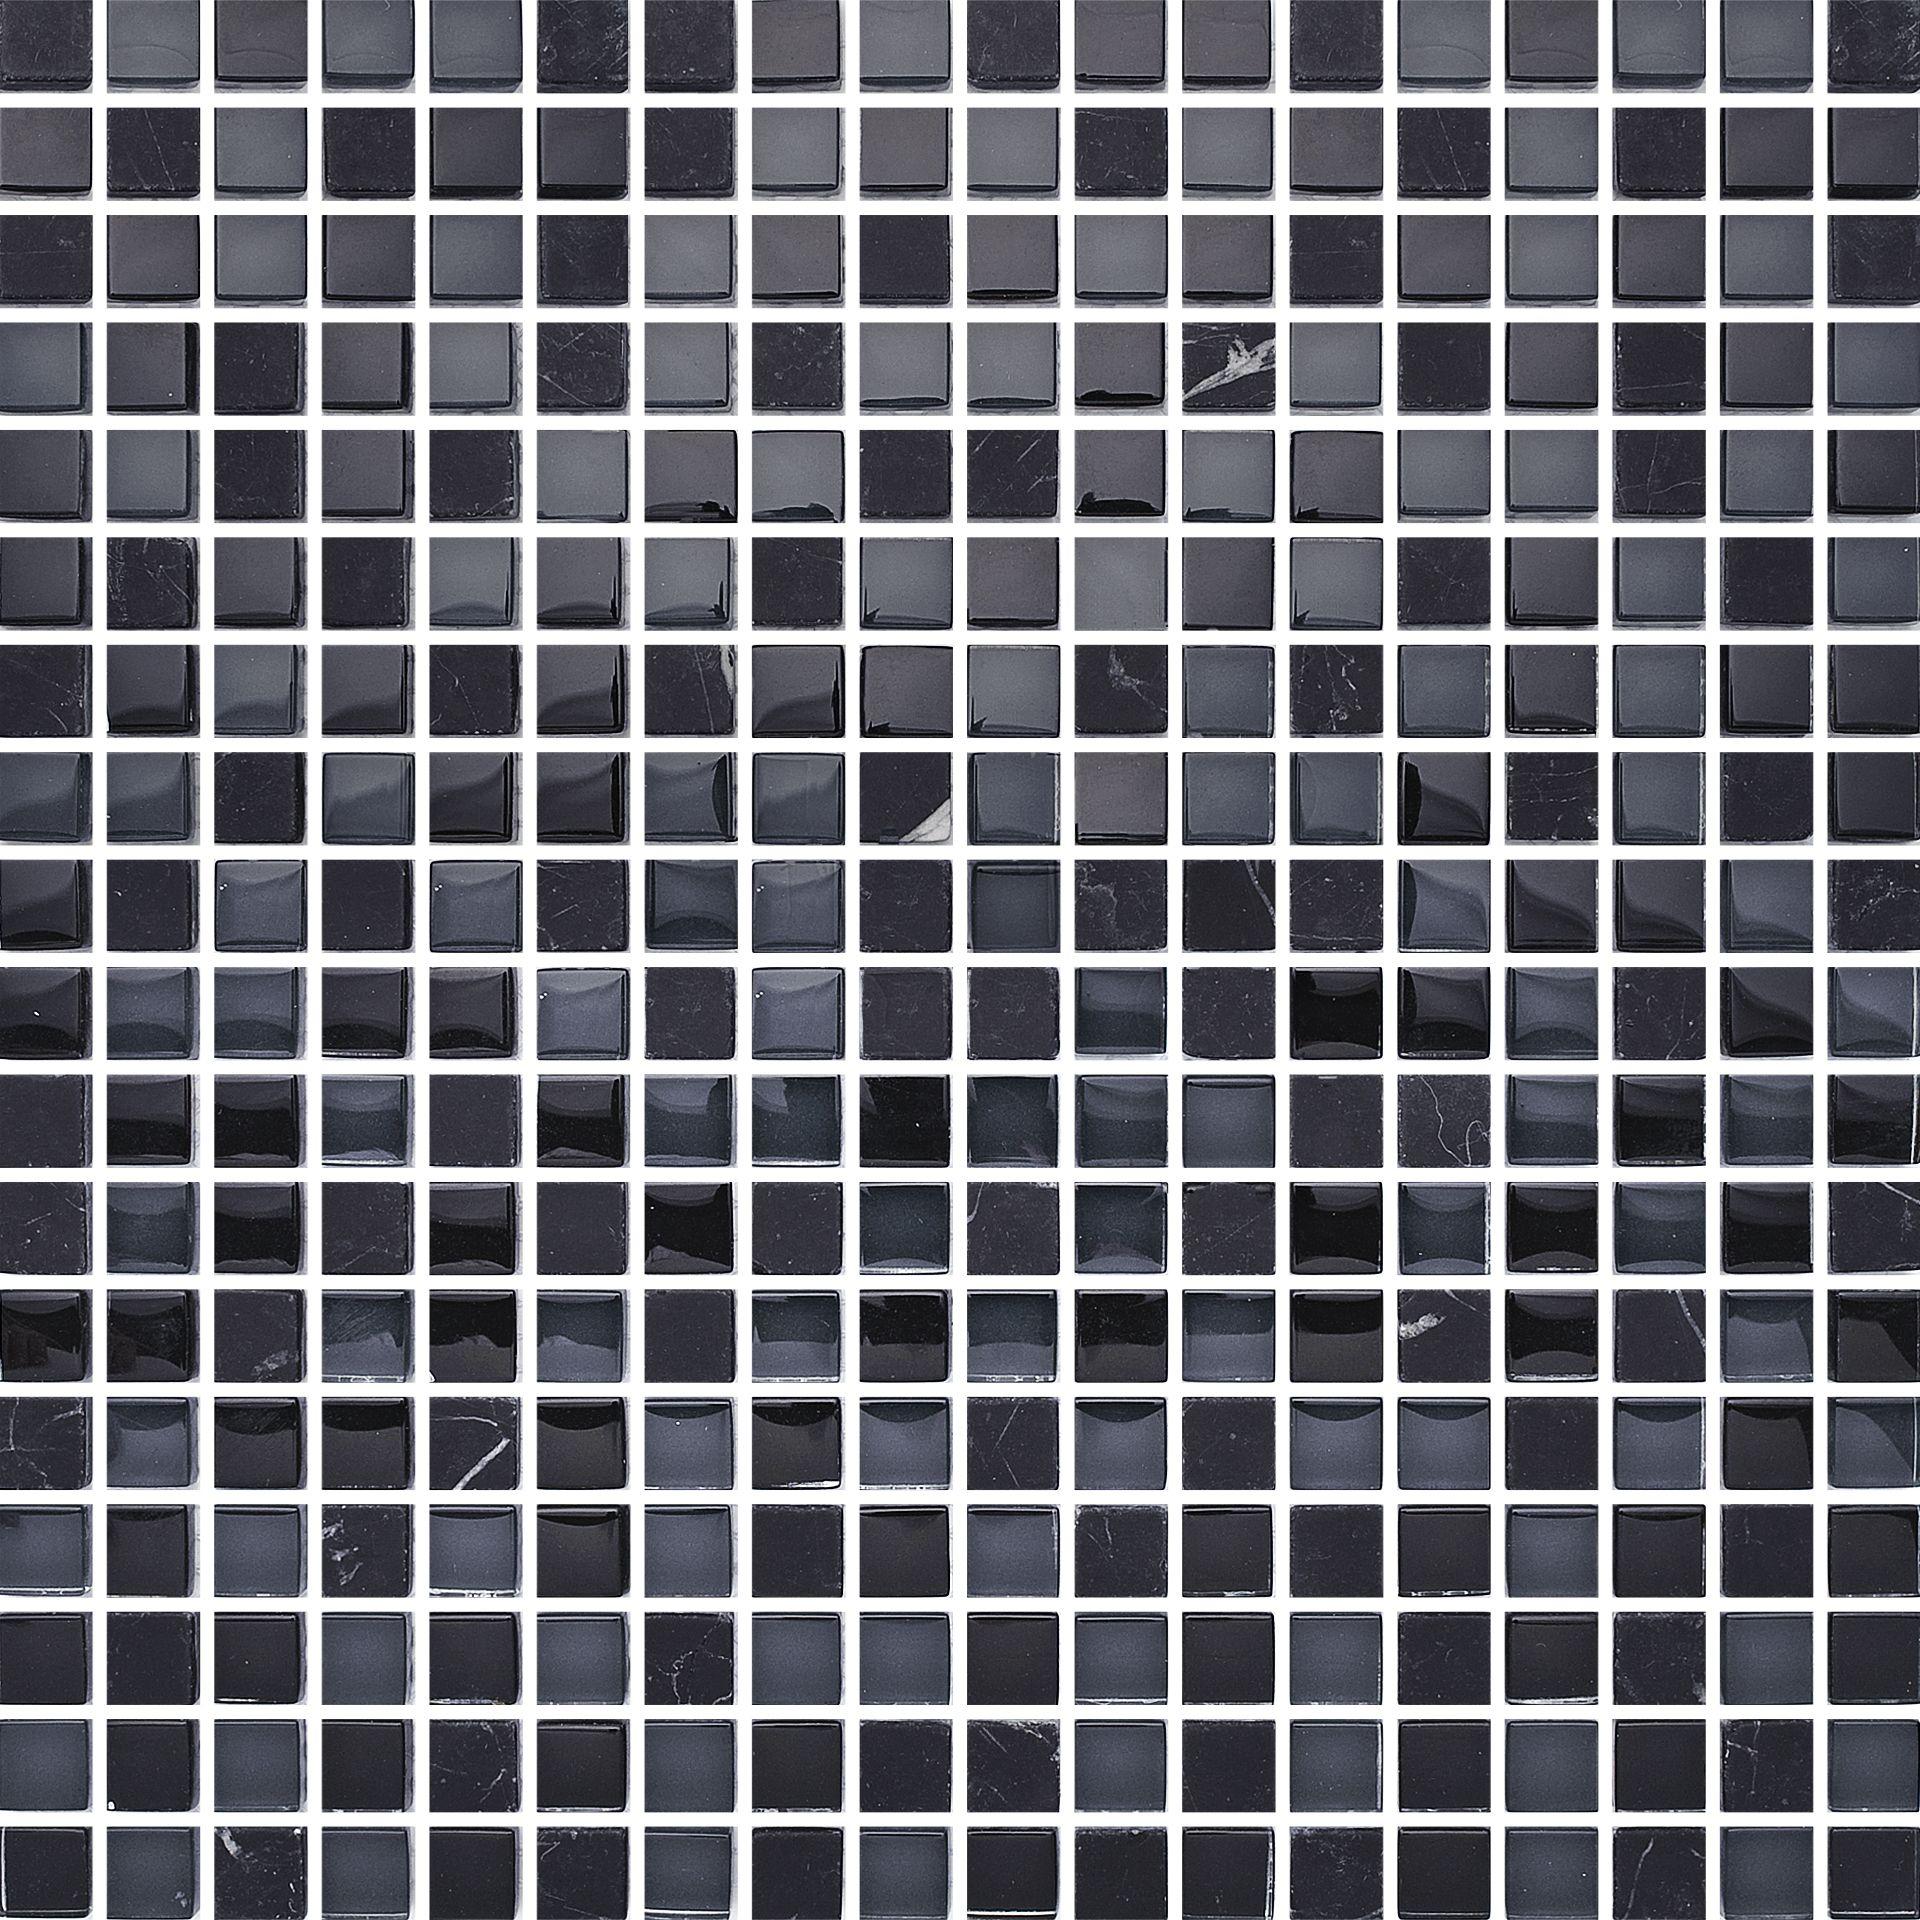 t1515 black mix stone. glasmosaik blandad med nero marquina marmor, Hause ideen